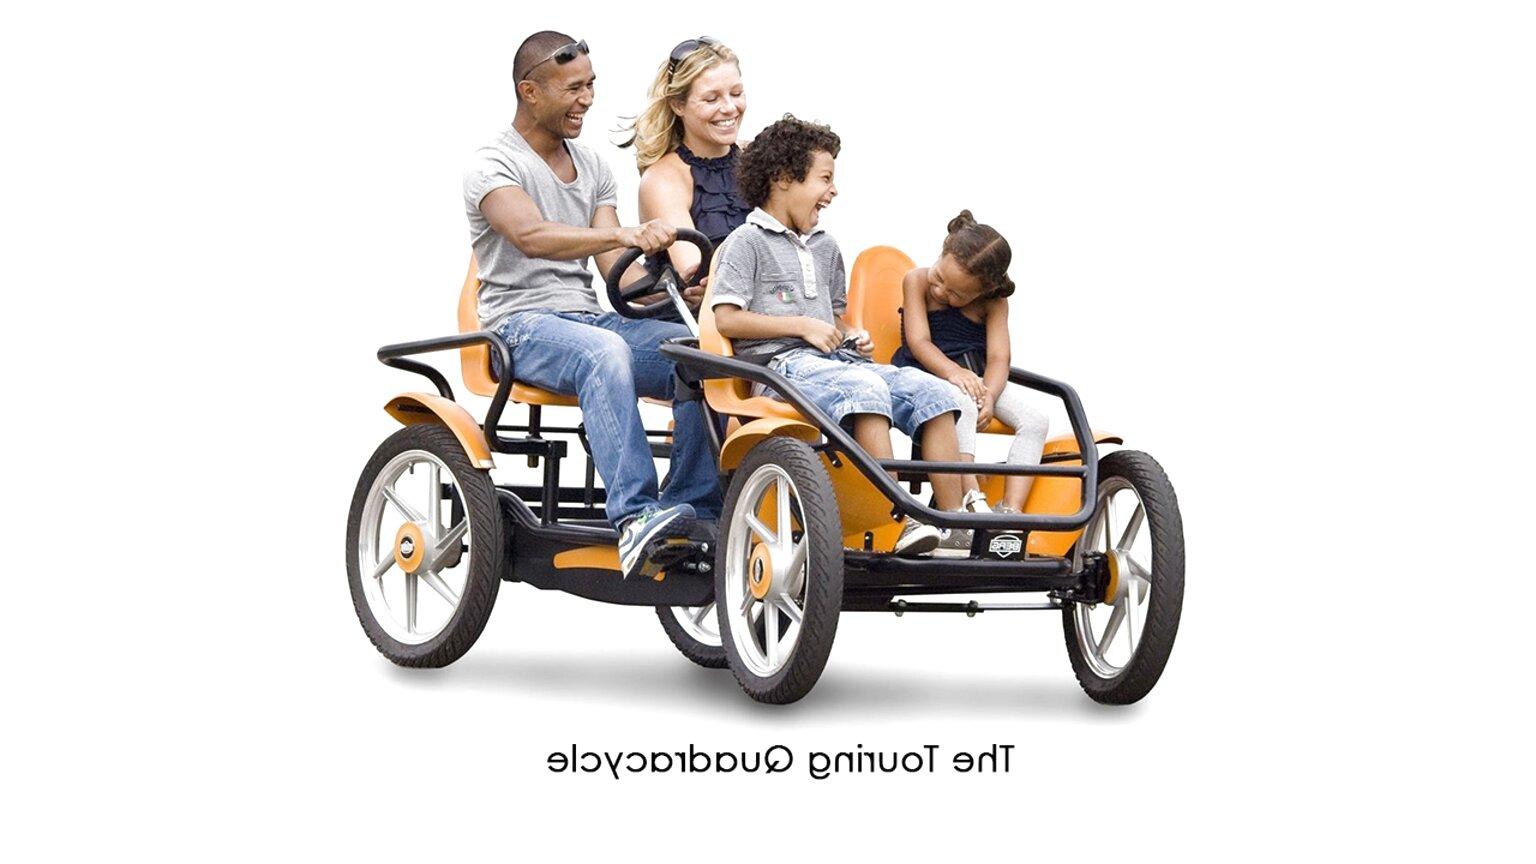 quadracycle for sale